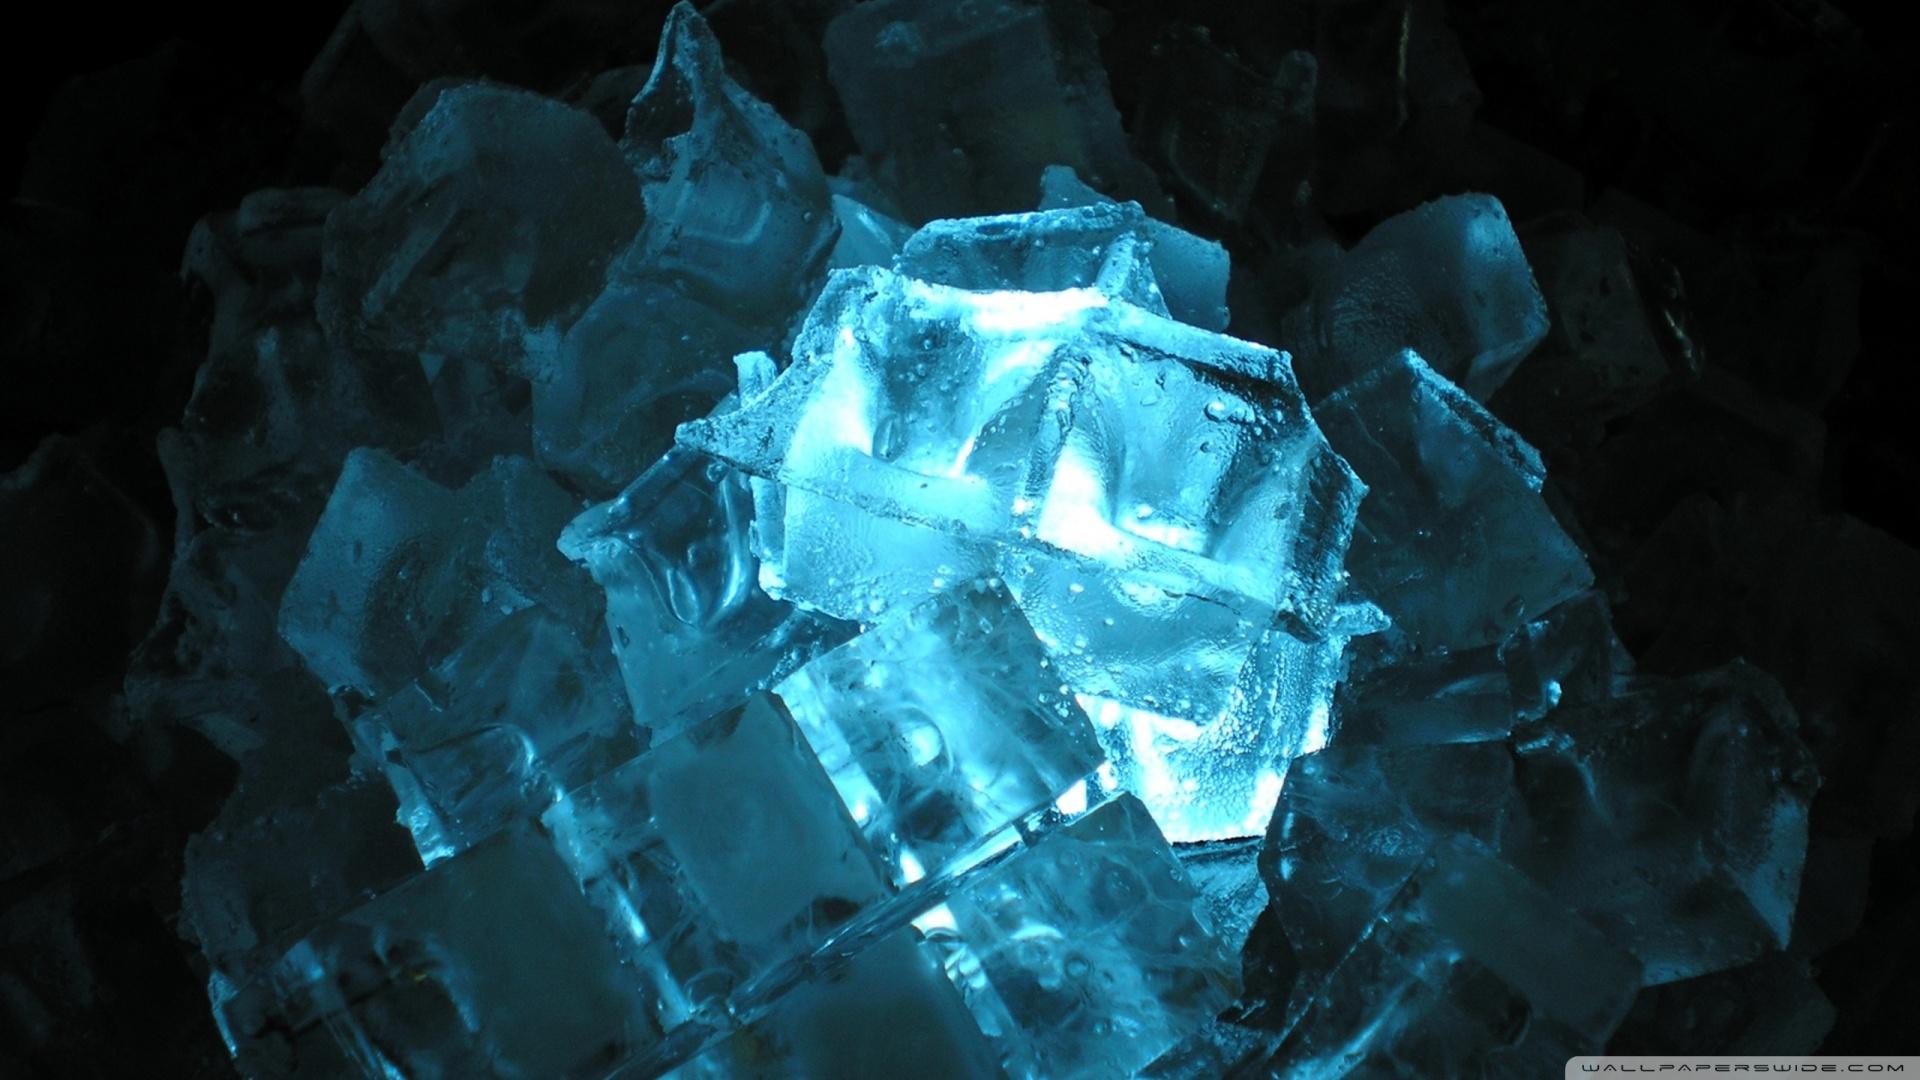 Download Ice Cubes Wallpaper 1920x1080 Wallpoper 447165 1920x1080